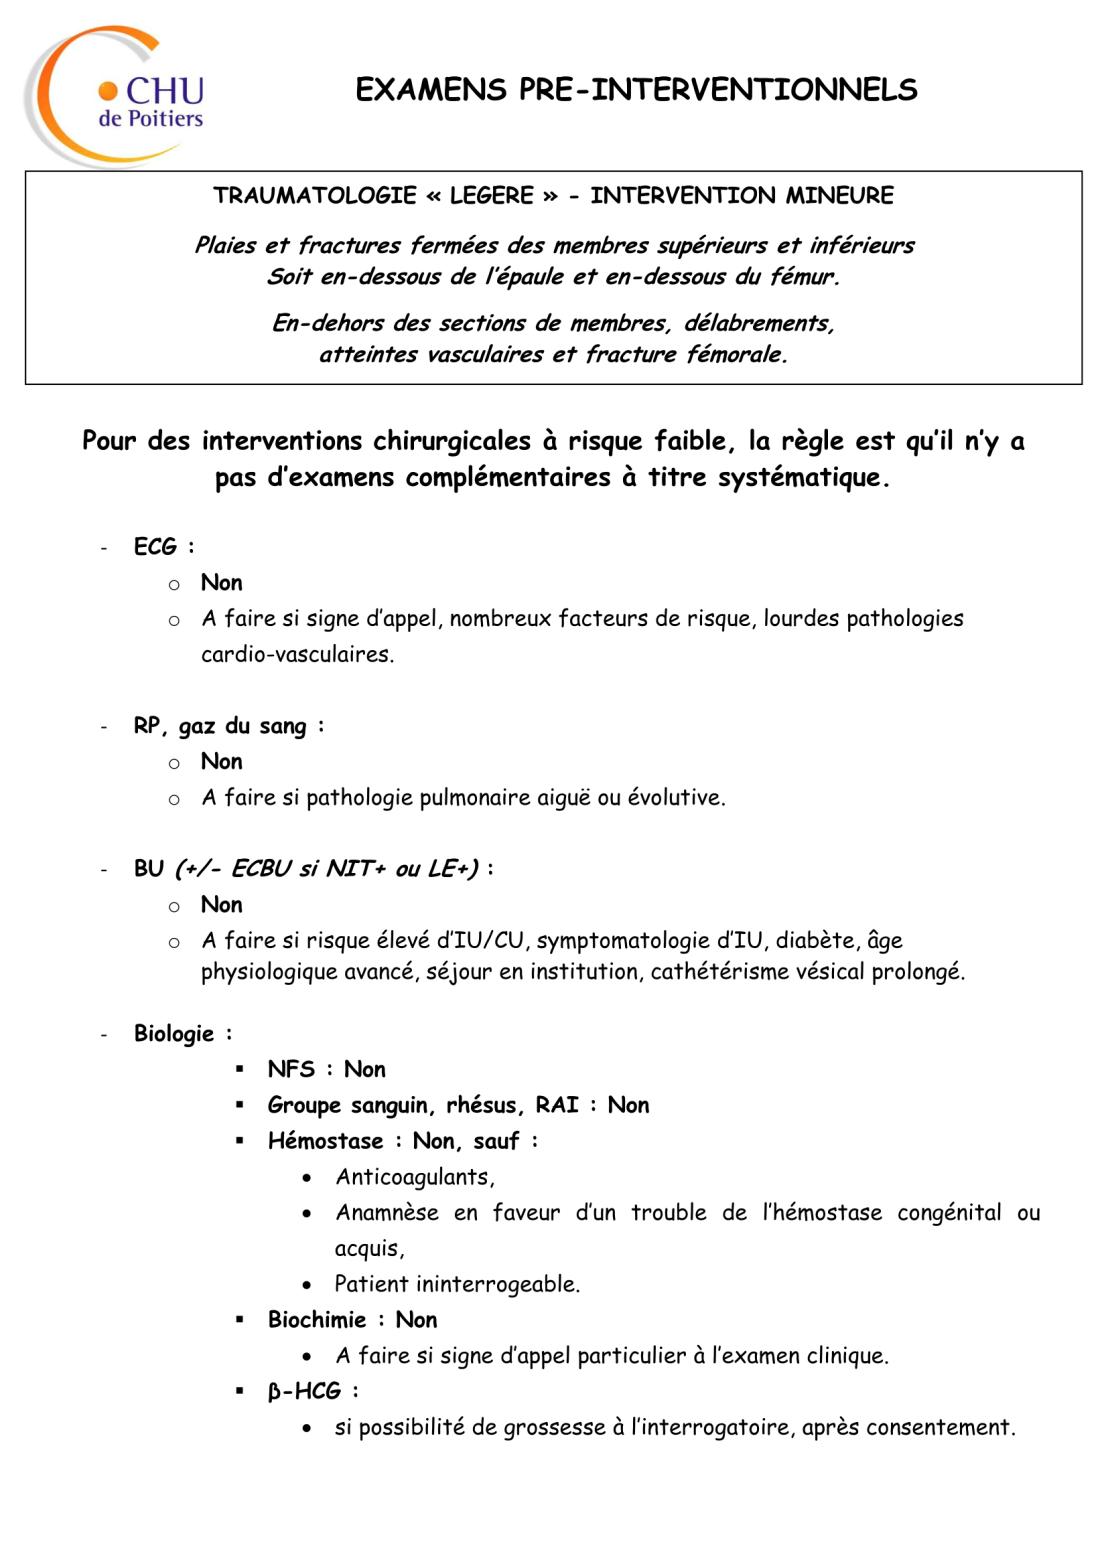 examens-pre-interventionnels-1